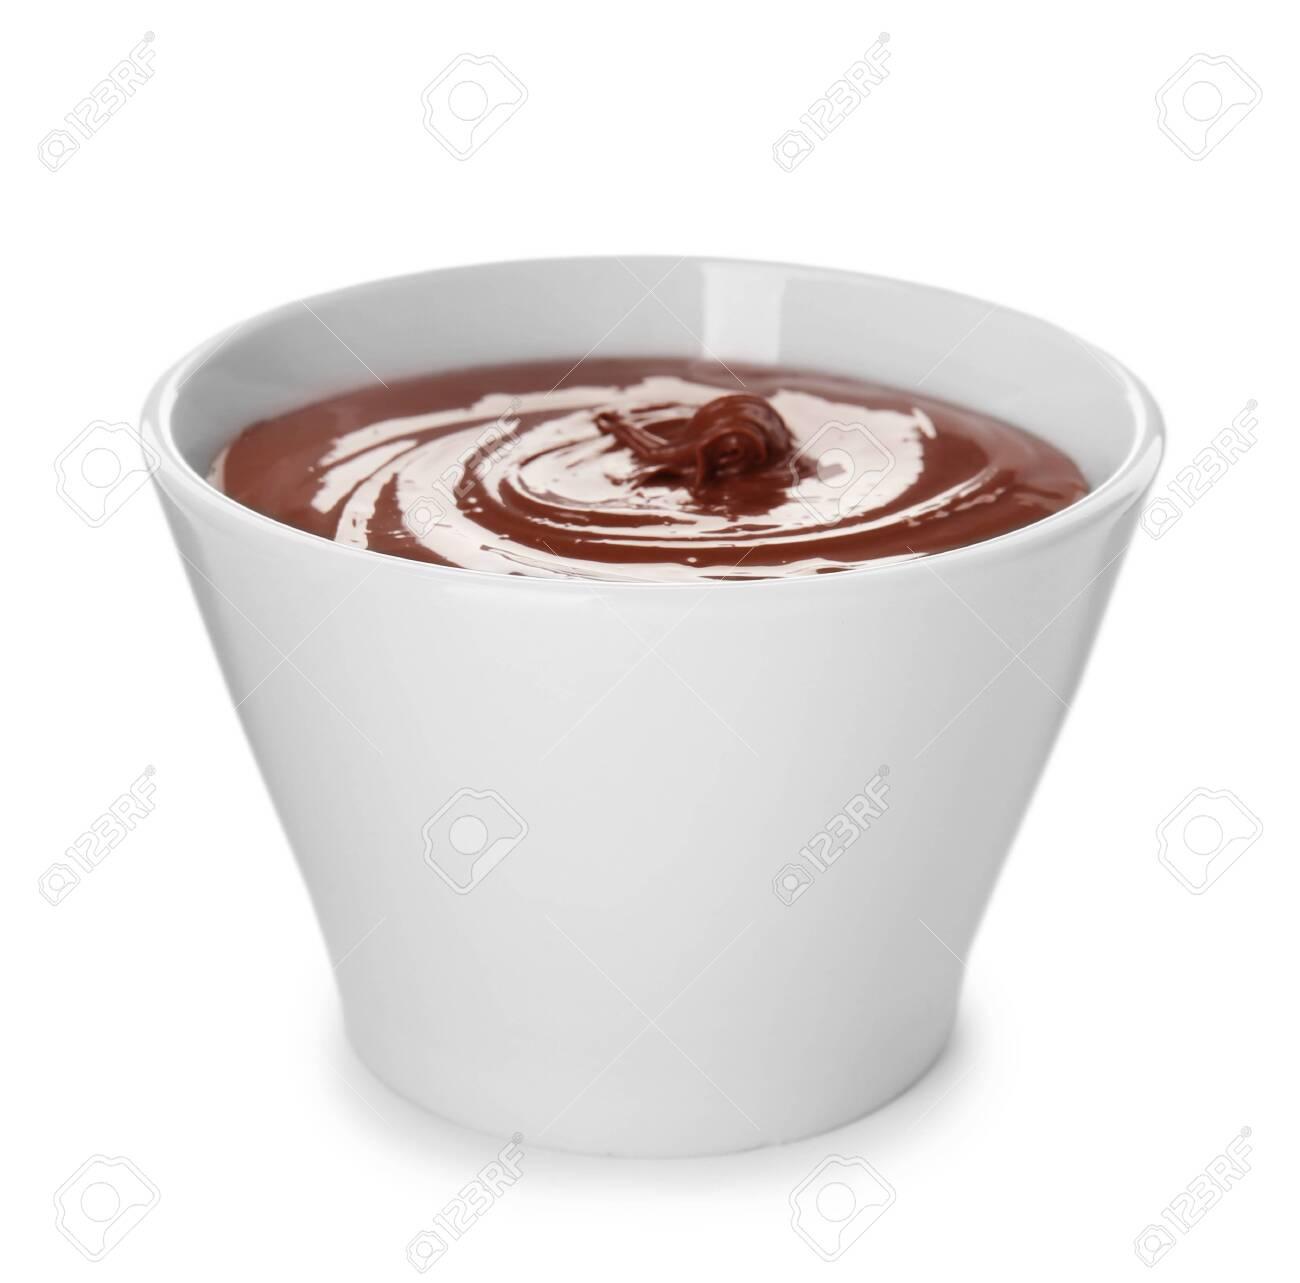 Bowl of sweet chocolate cream isolated on white - 120964146